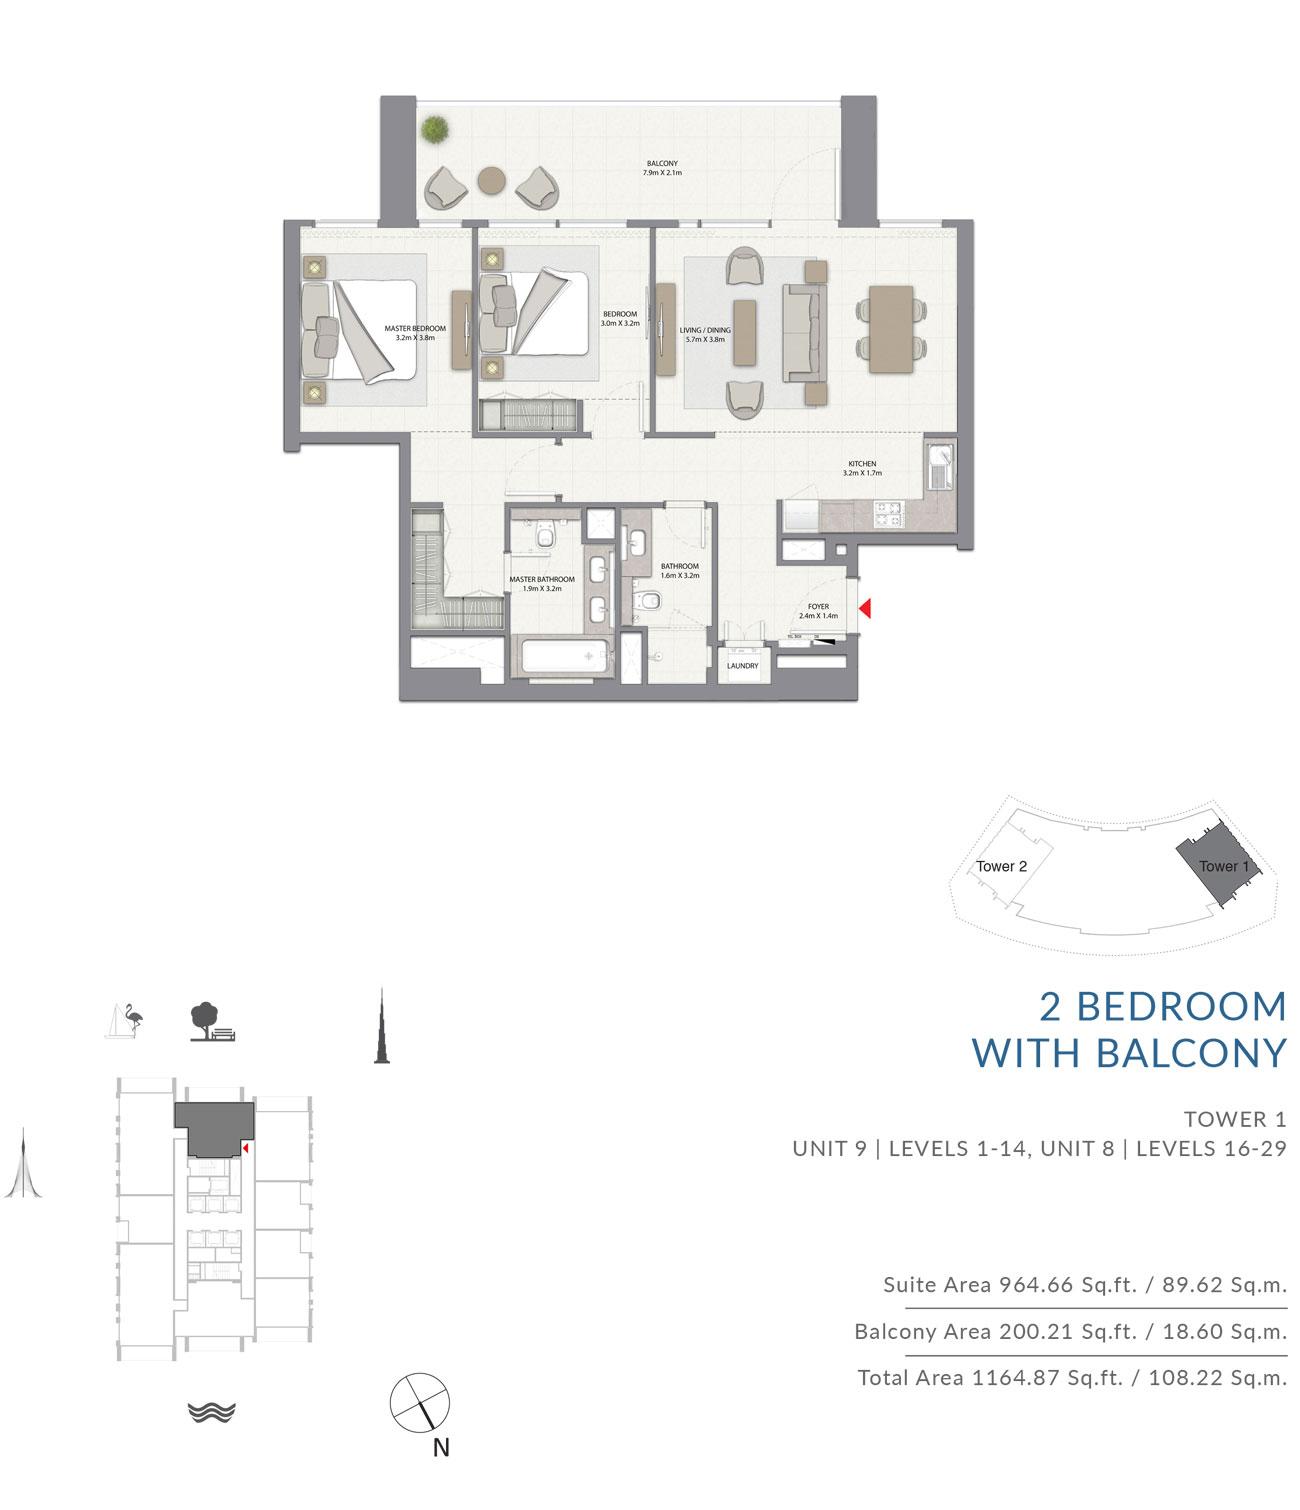 2 Bedroom With Balcony